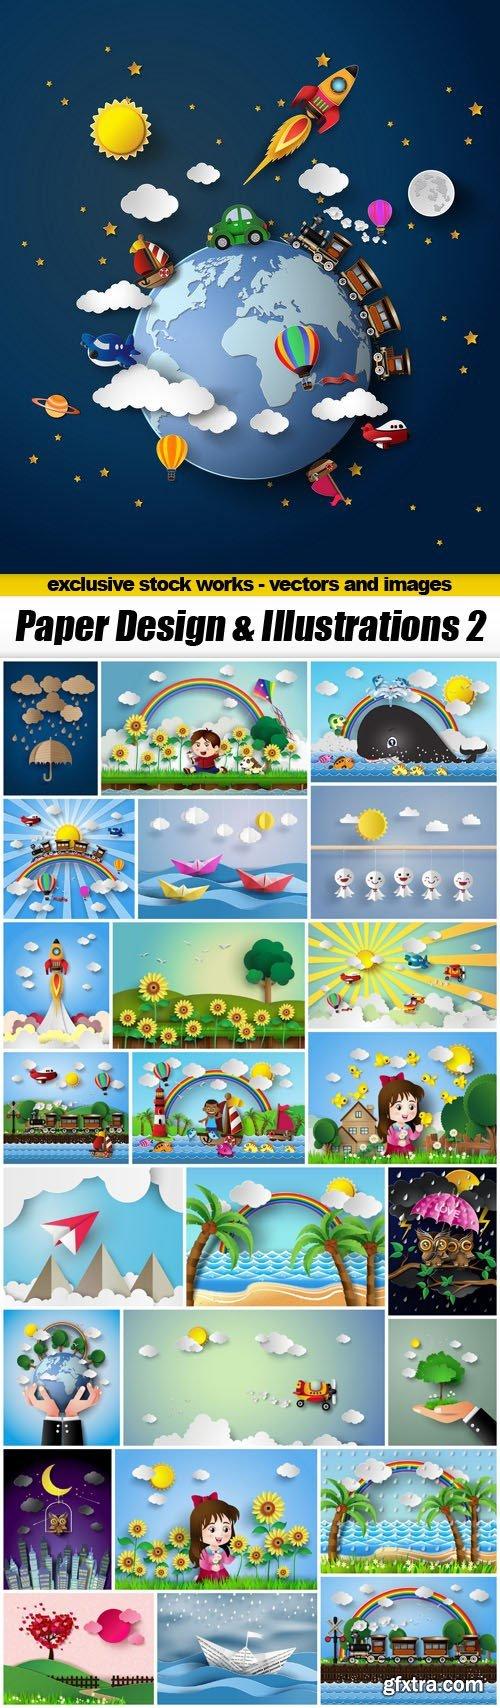 Paper Design & Illustrations 2 - 25xEPS